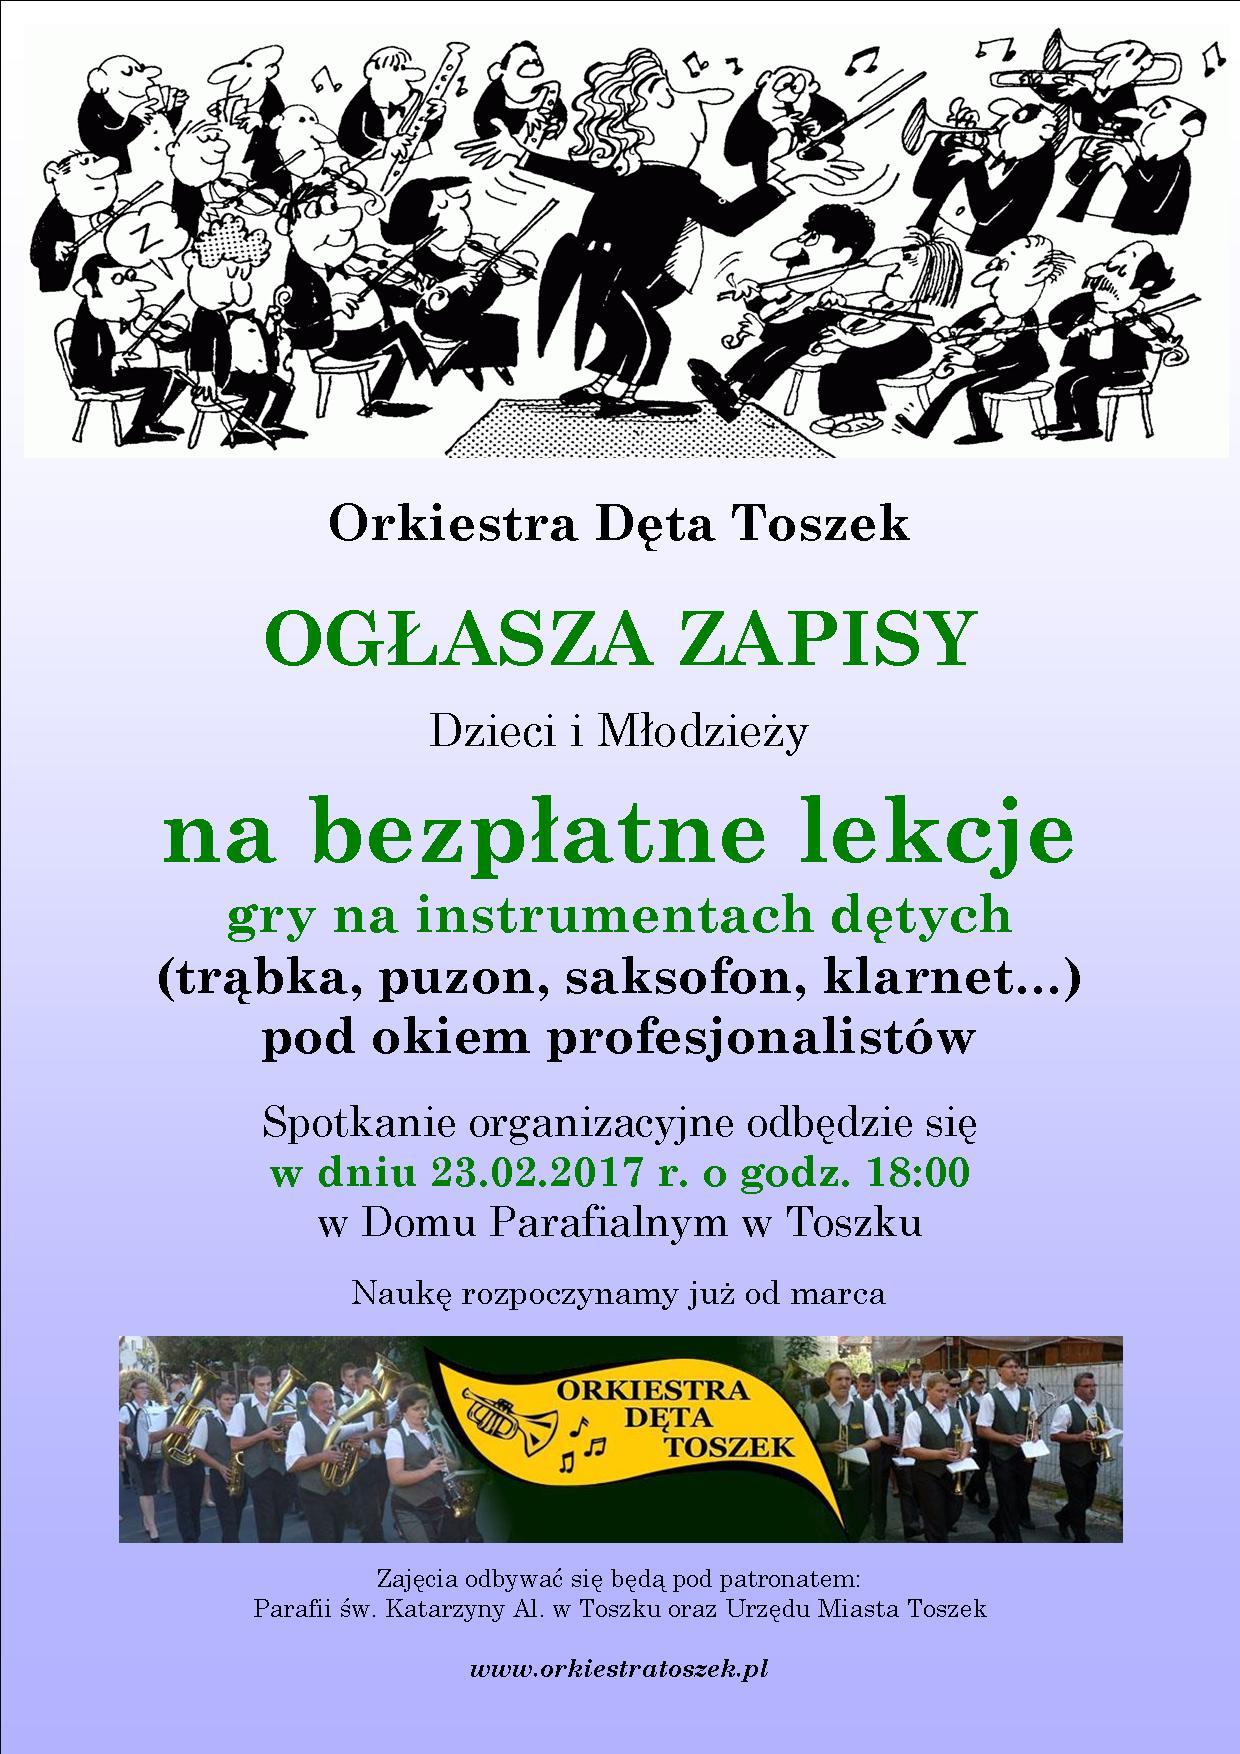 Plakat - Orkiestra Toszek